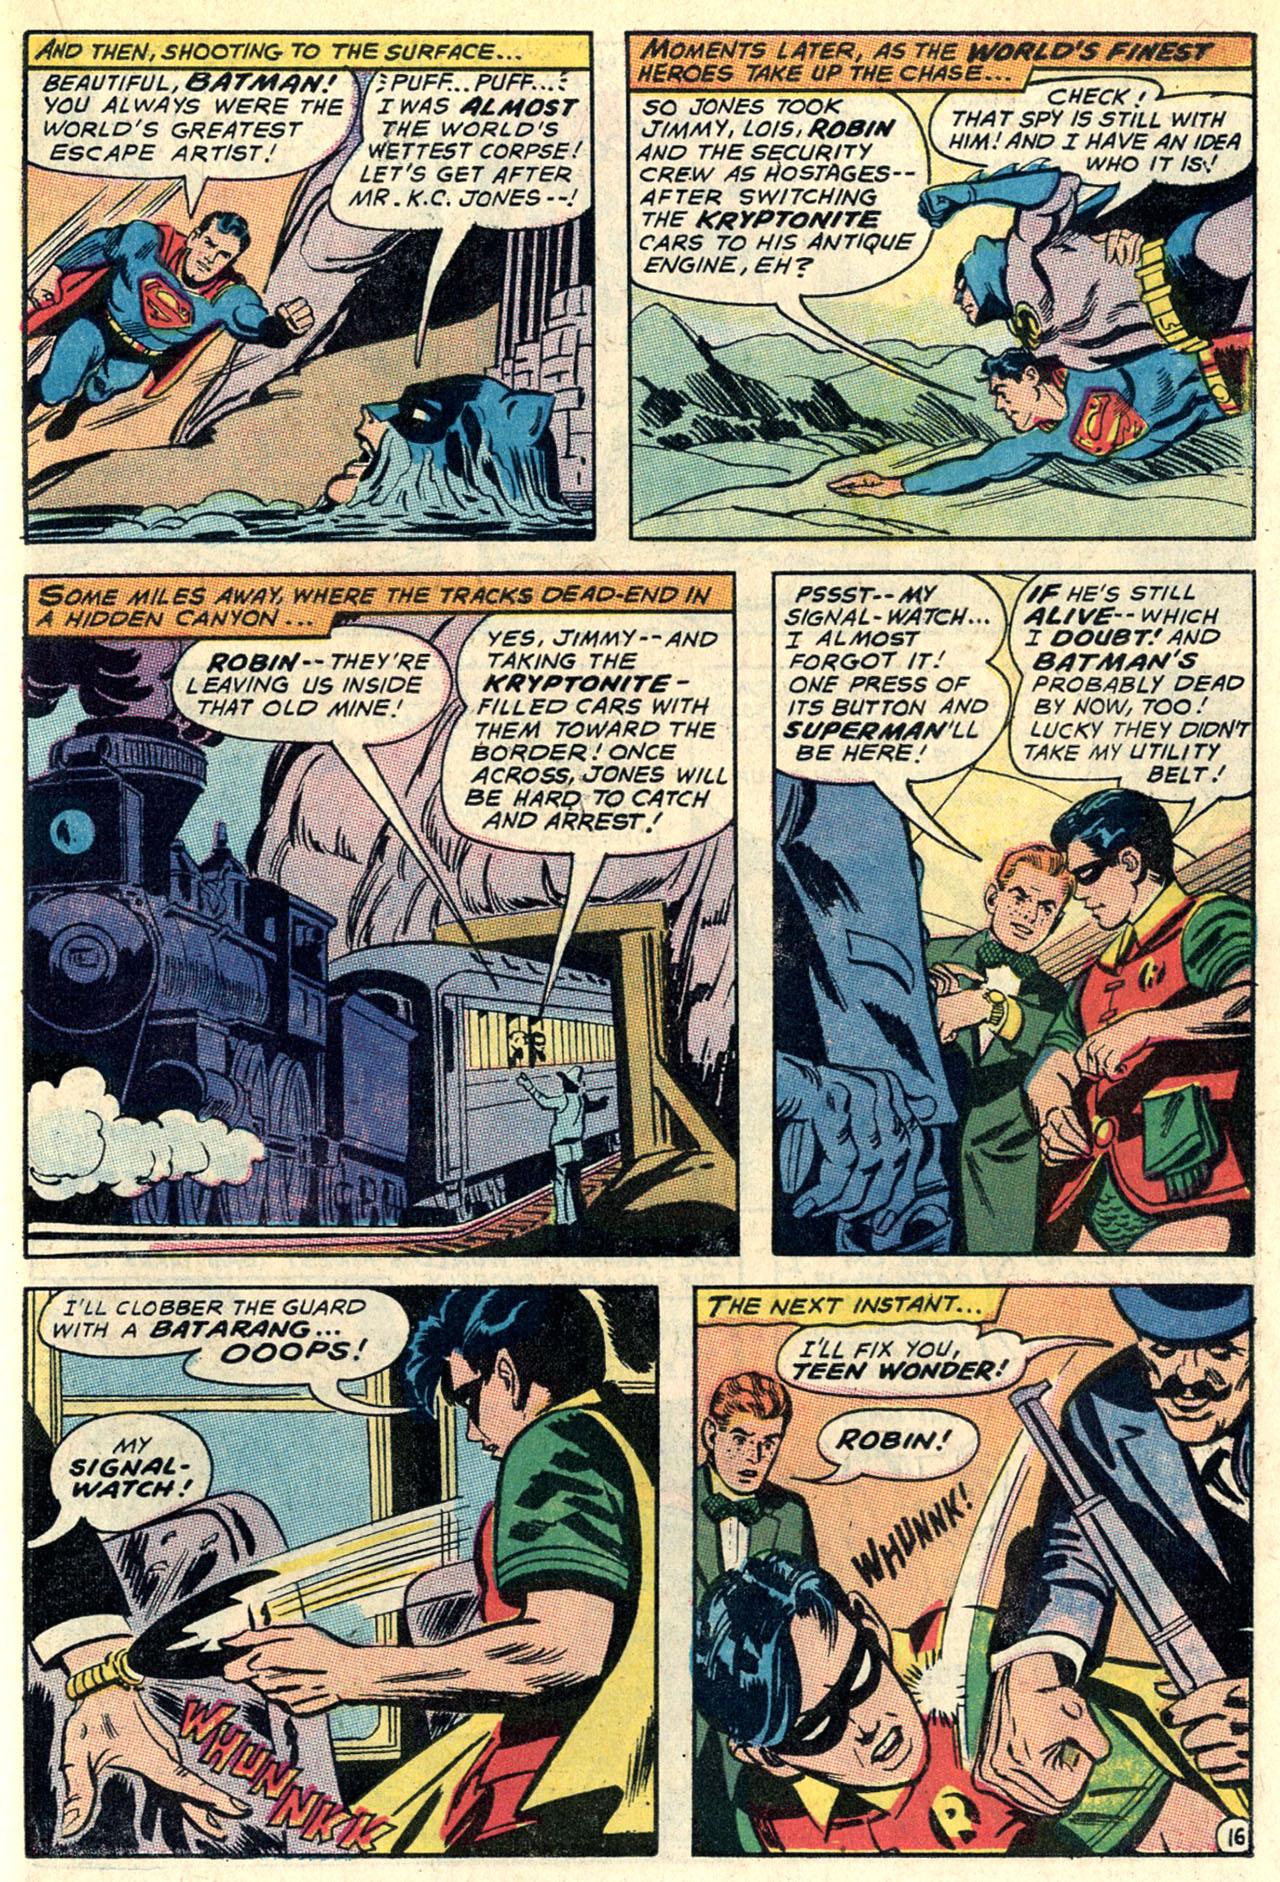 Read online World's Finest Comics comic -  Issue #196 - 23